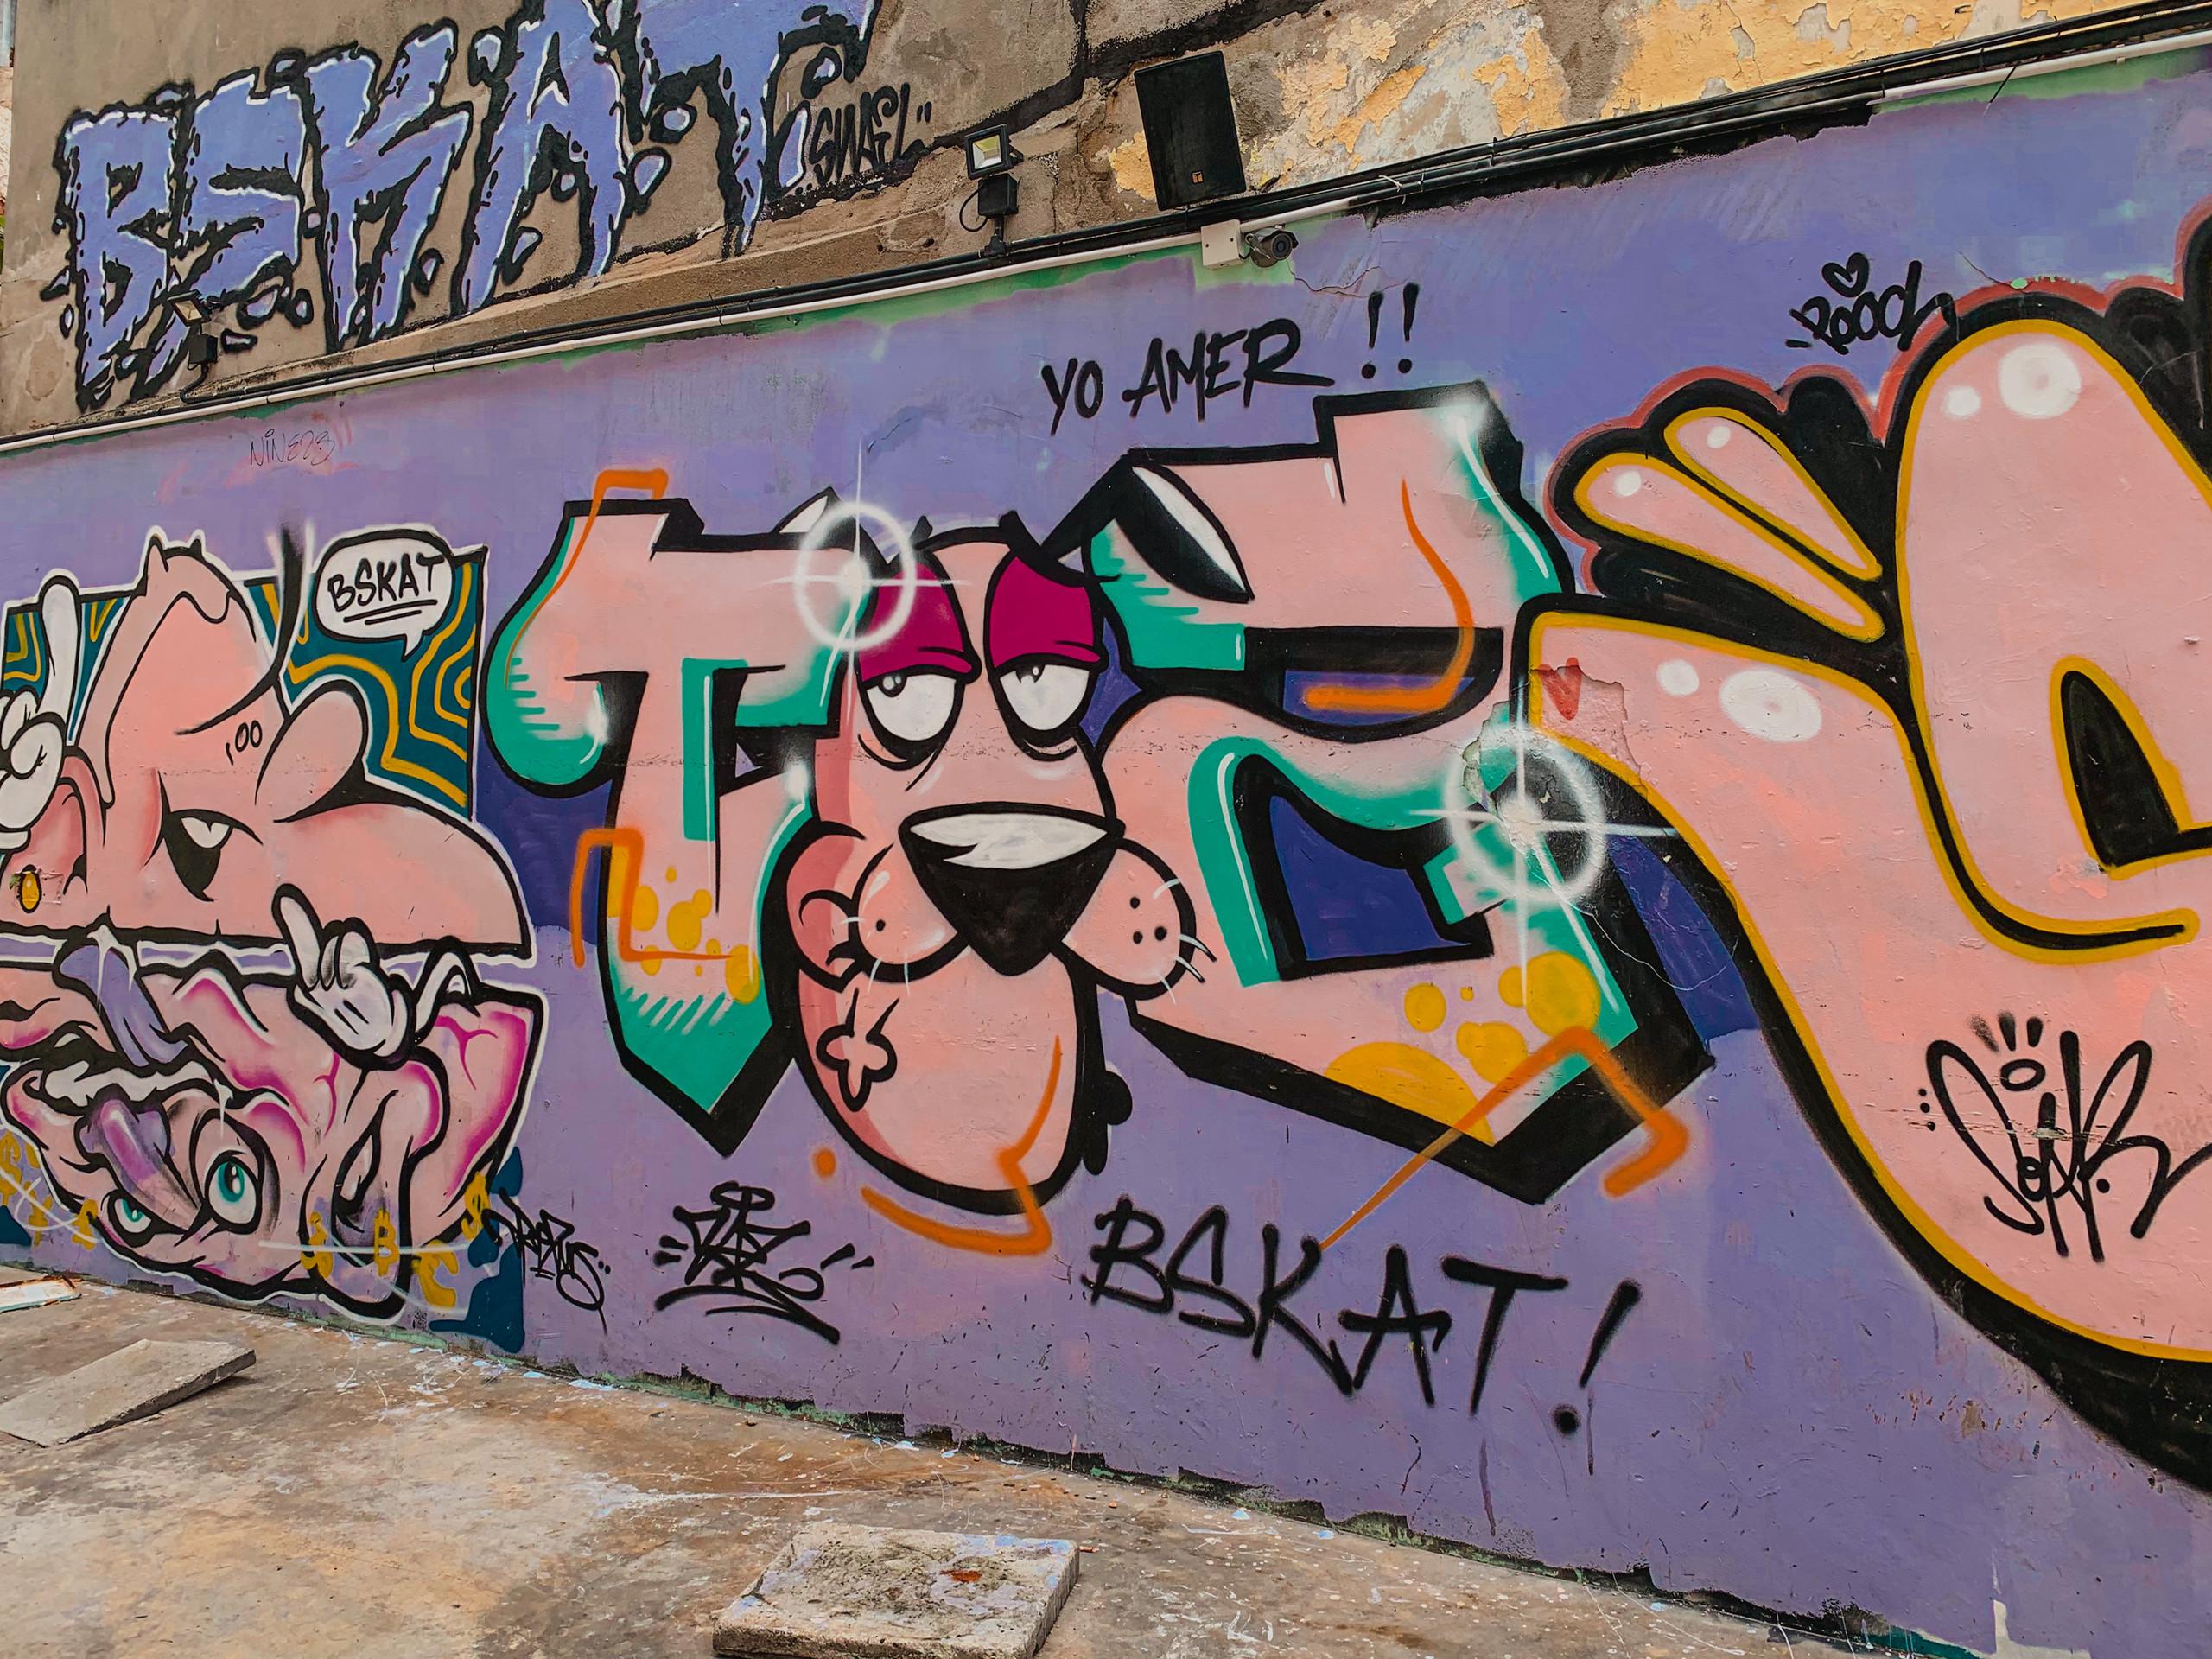 Colourful street art mural, Hin Bus Depot, Penang, RollingBear Travels photography.